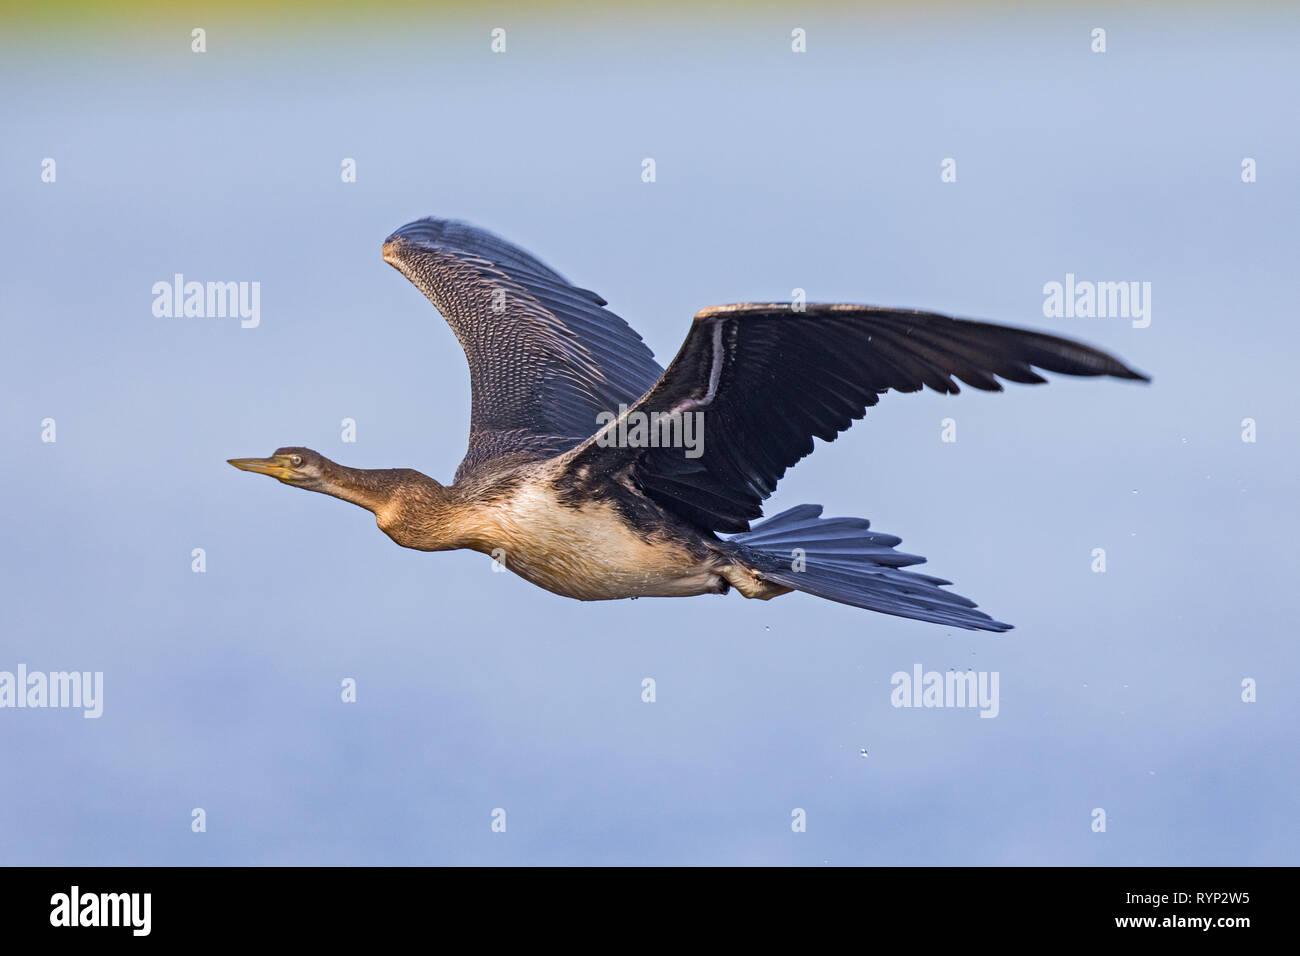 Australian darter (Anhinga novaehollandiae) - Stock Image